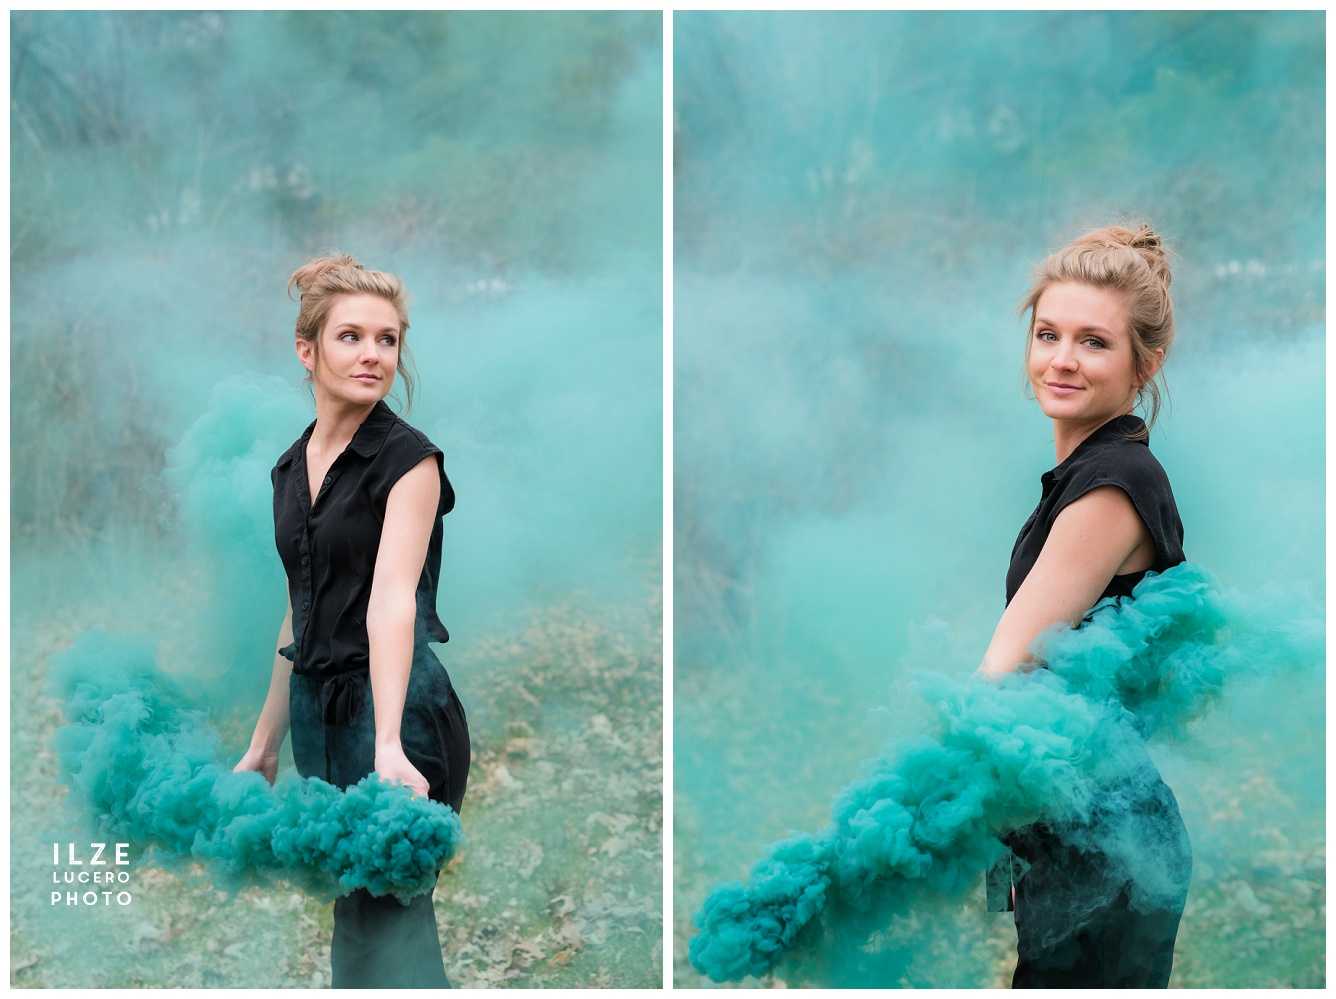 Green Smoke Photo Shoot Michigan Photographer